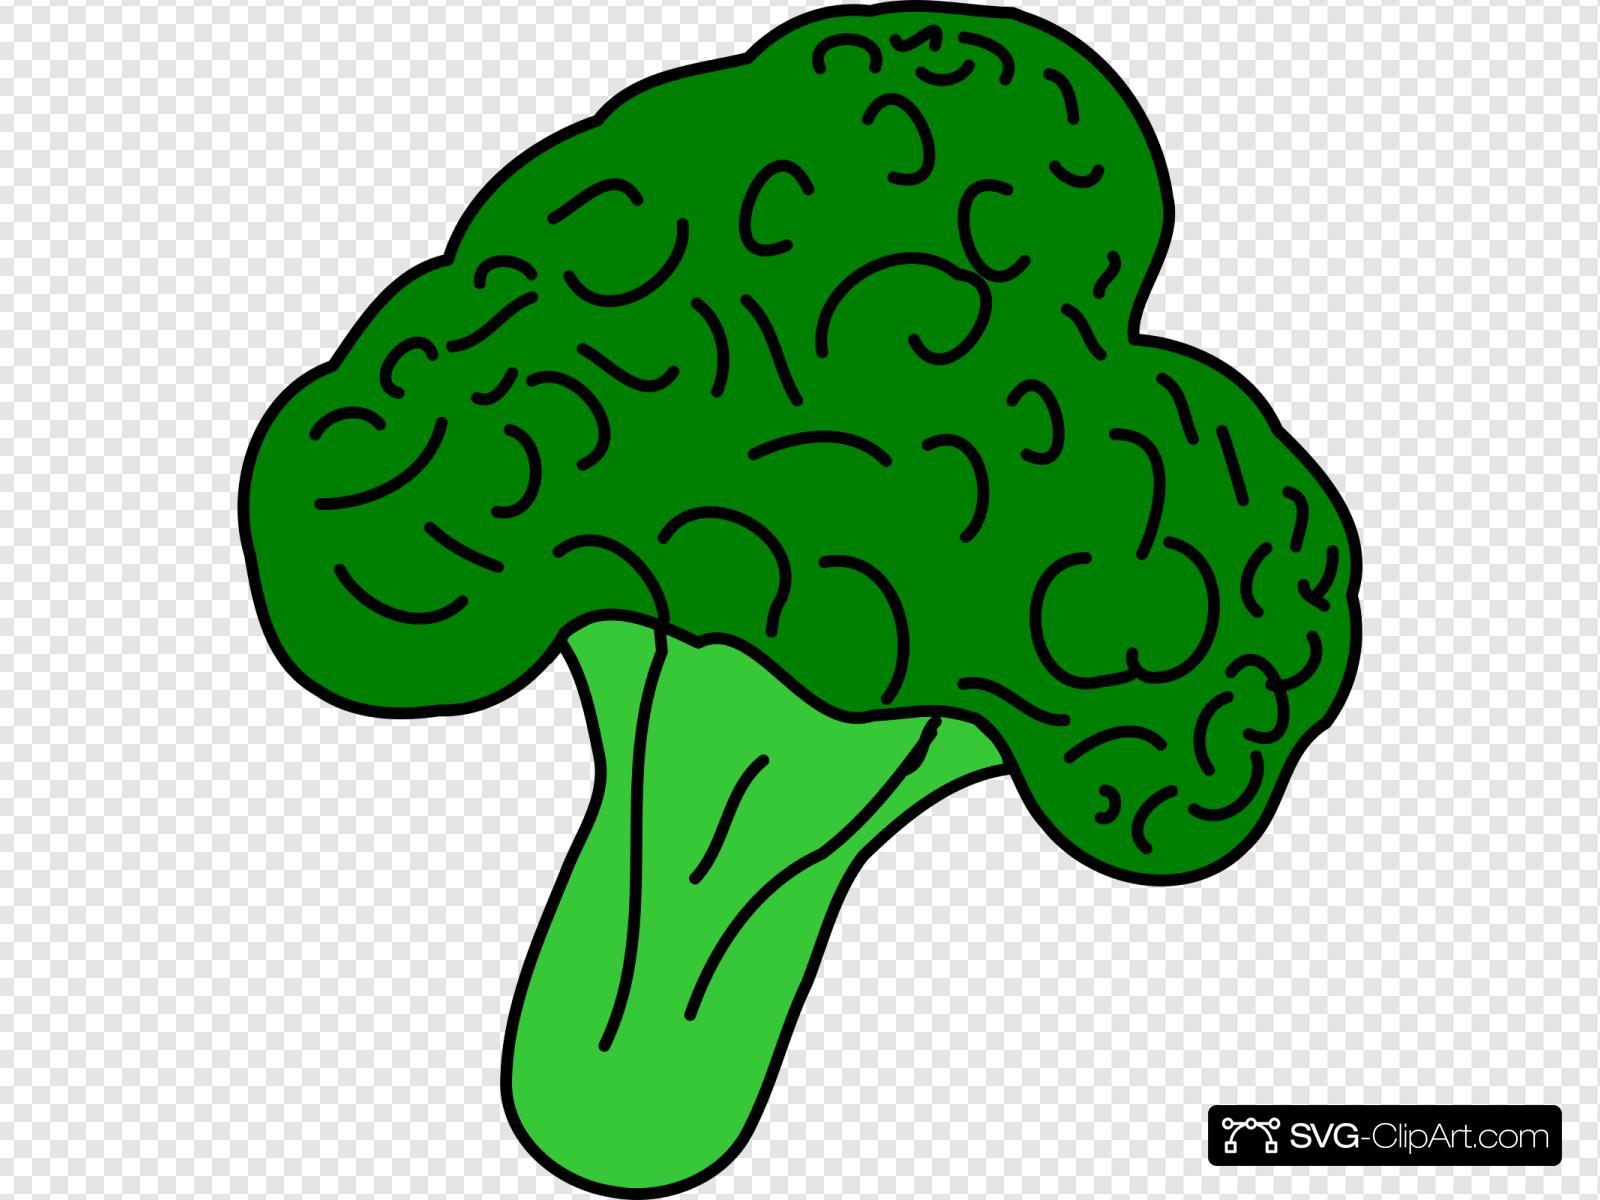 broccoli svg vector broccoli clip art svg clipart broccoli svg vector broccoli clip art